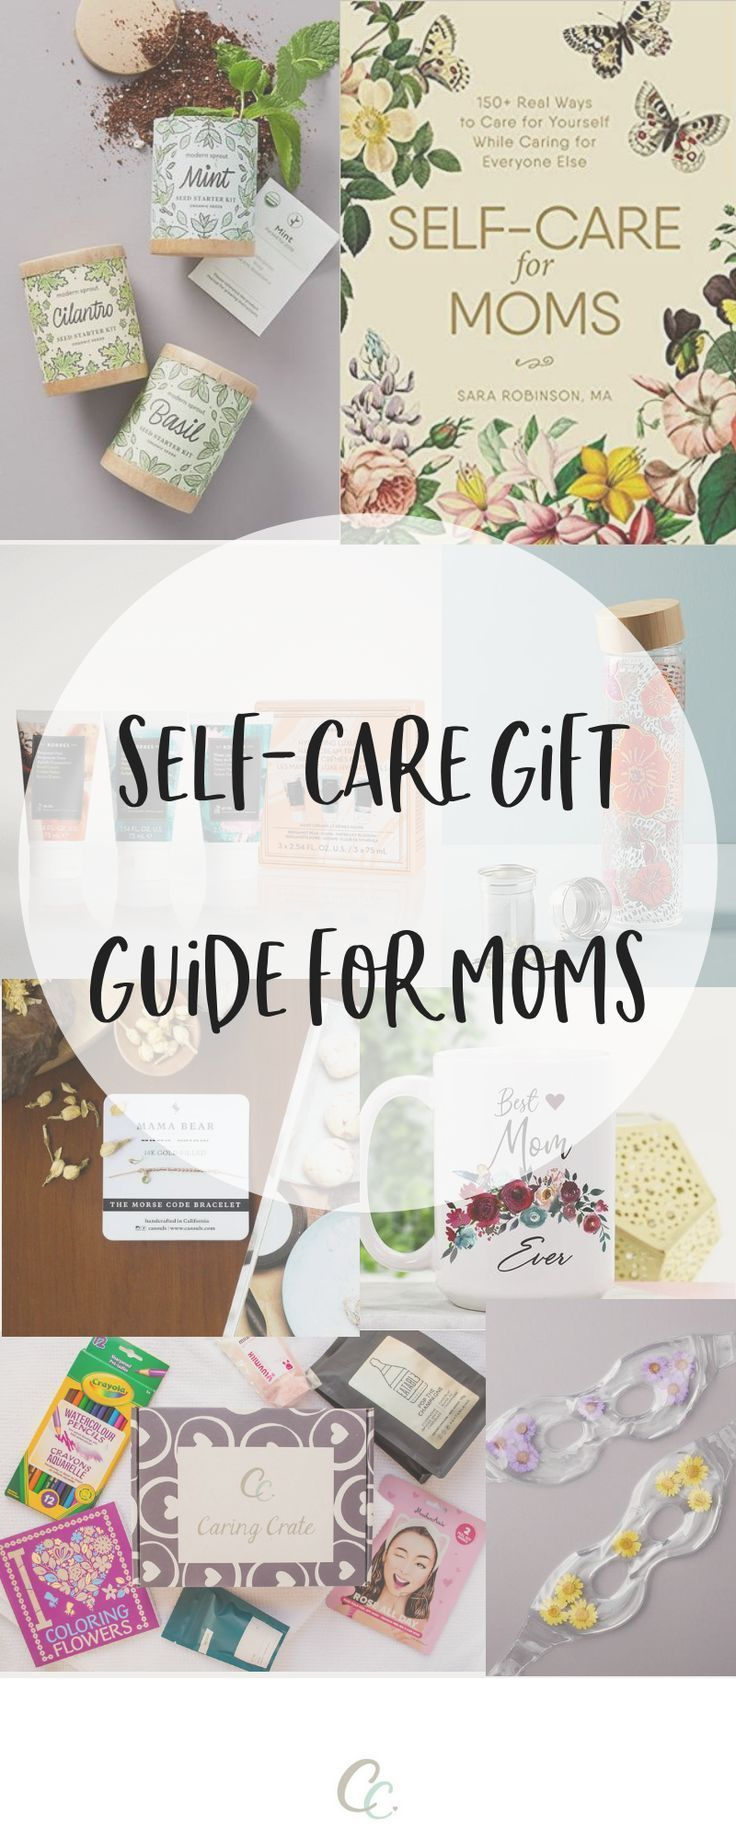 SelfCare Gift Guide for Moms Gift guide, Homemade